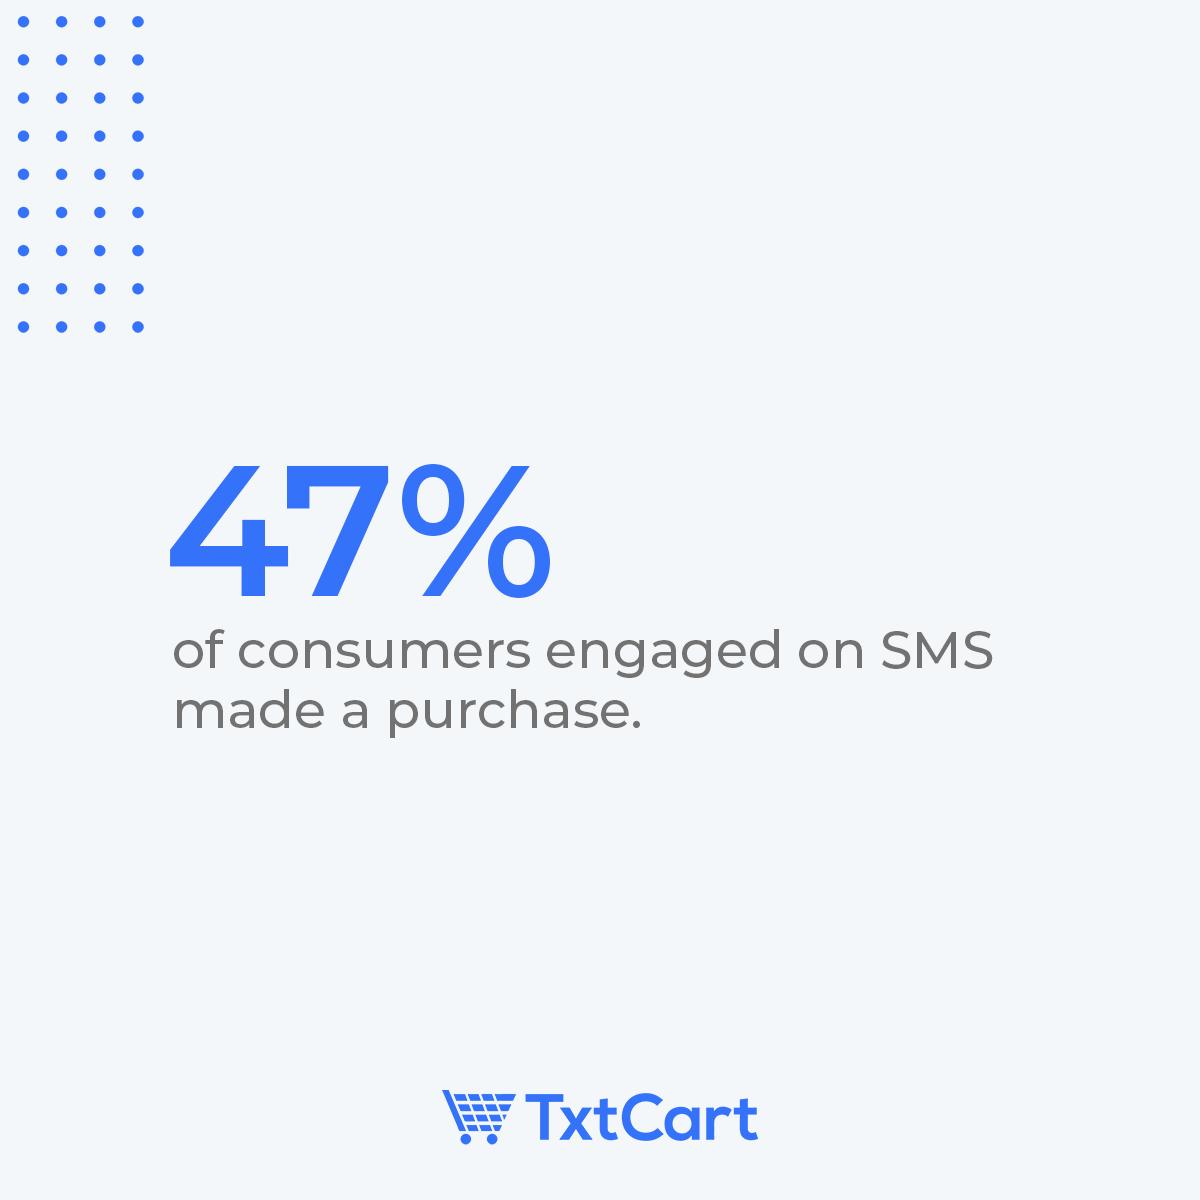 sms marketing statistics